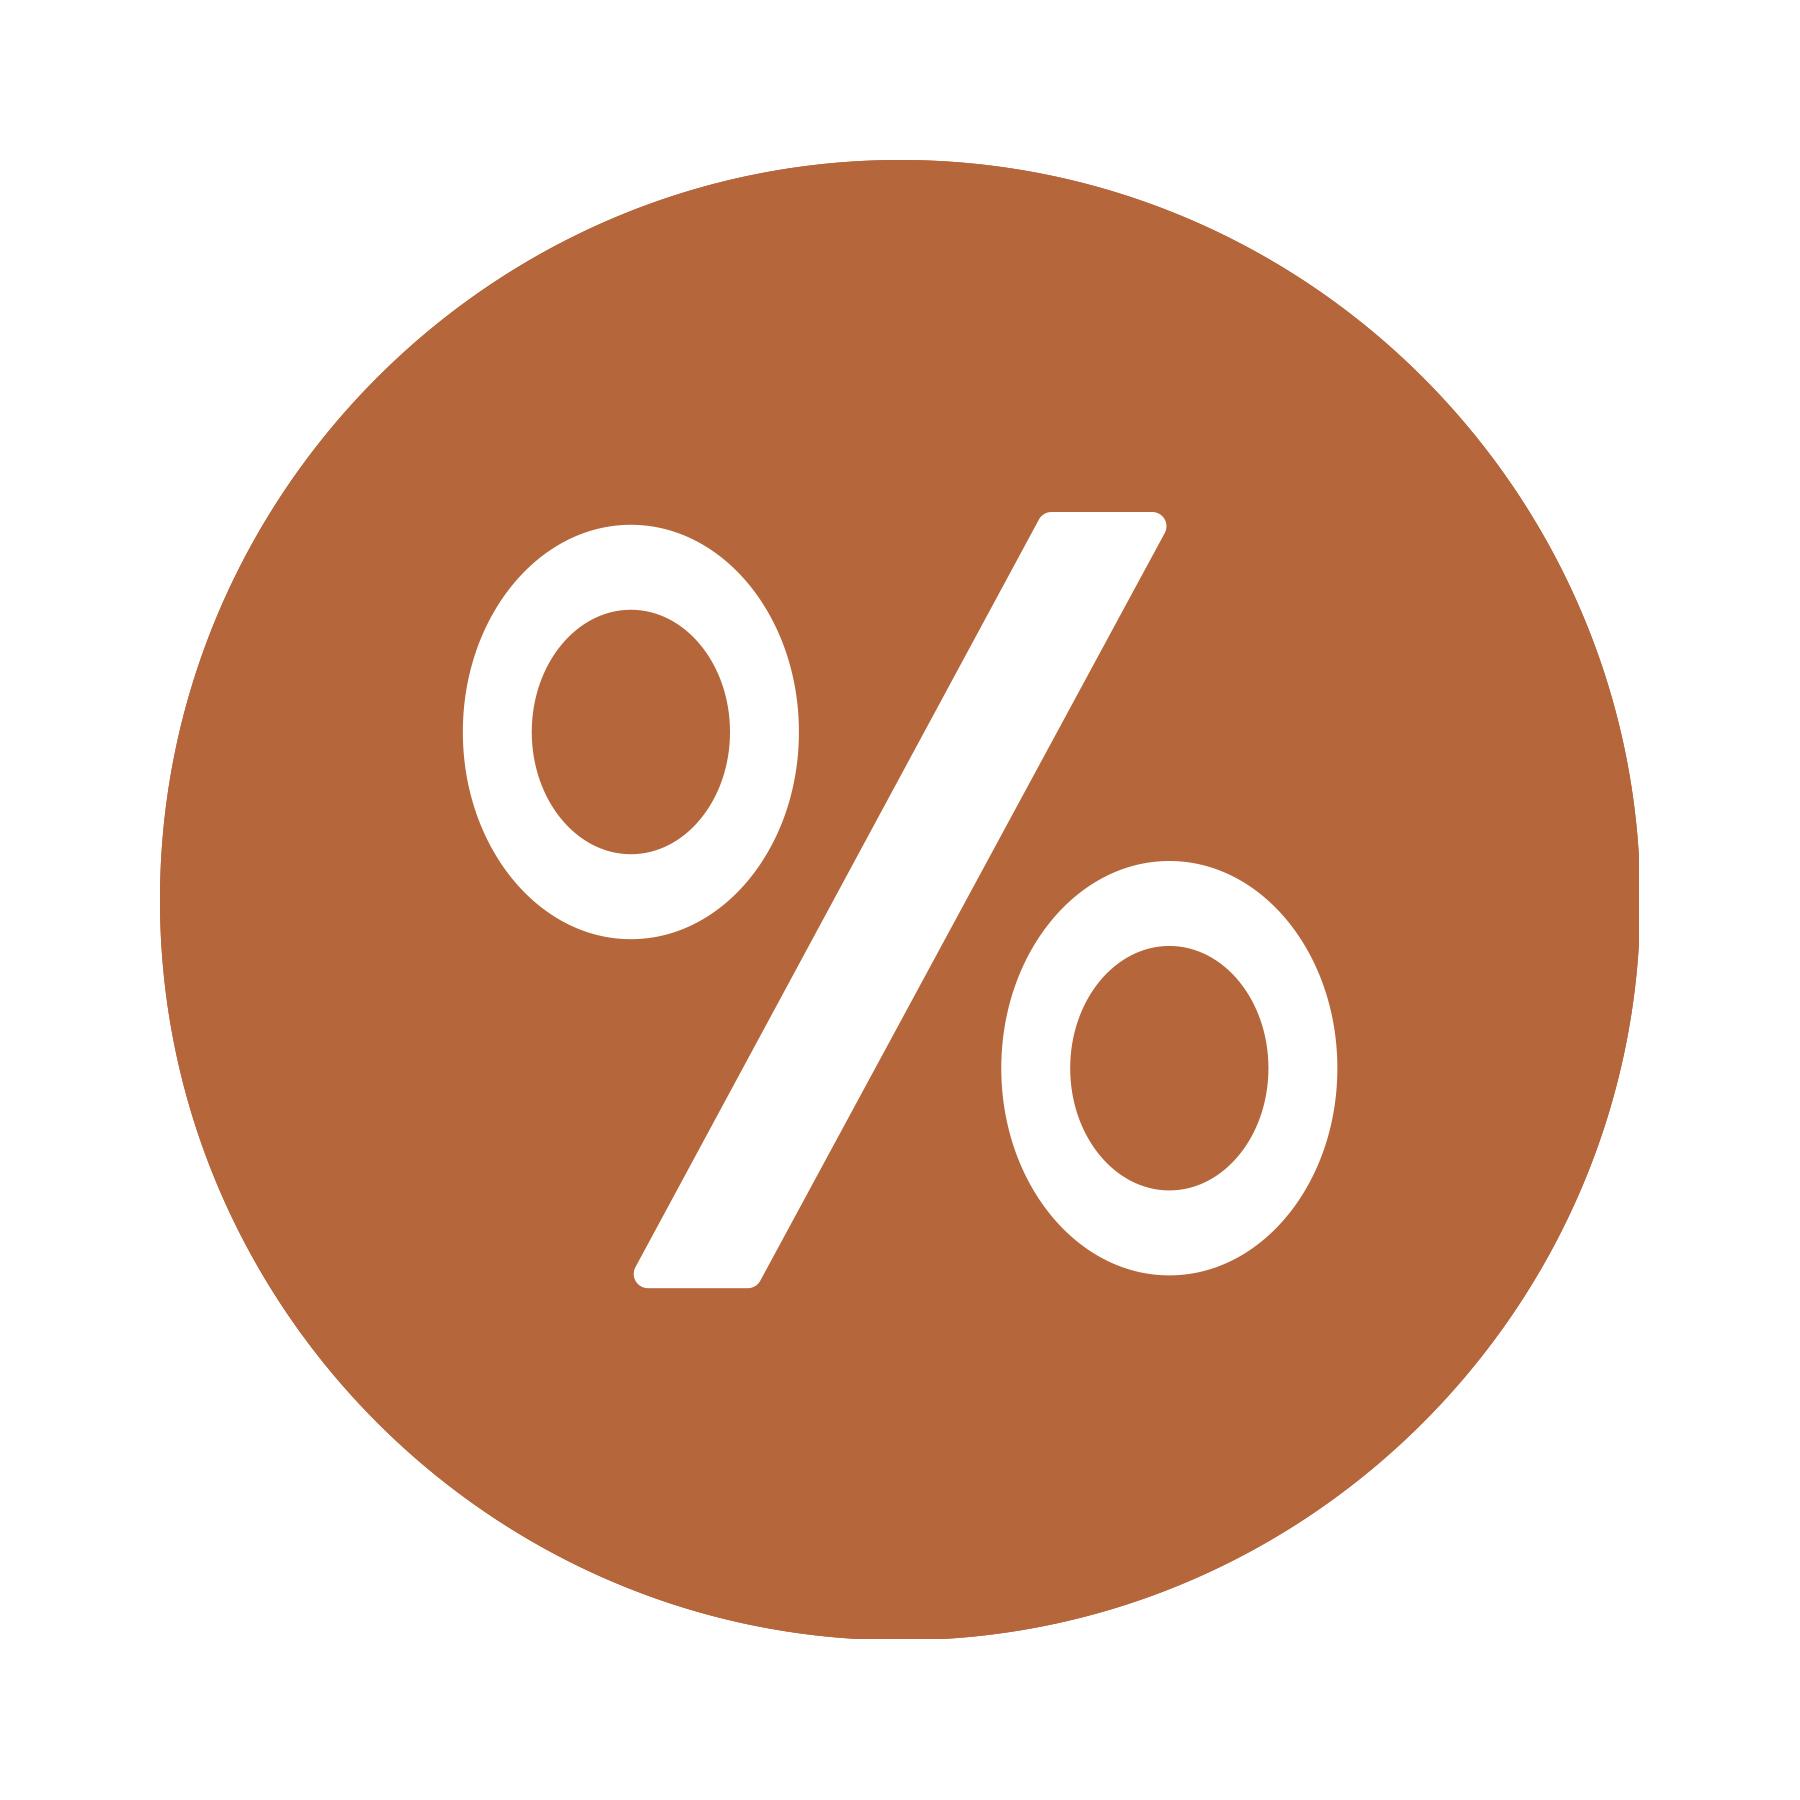 icon with percent symbol